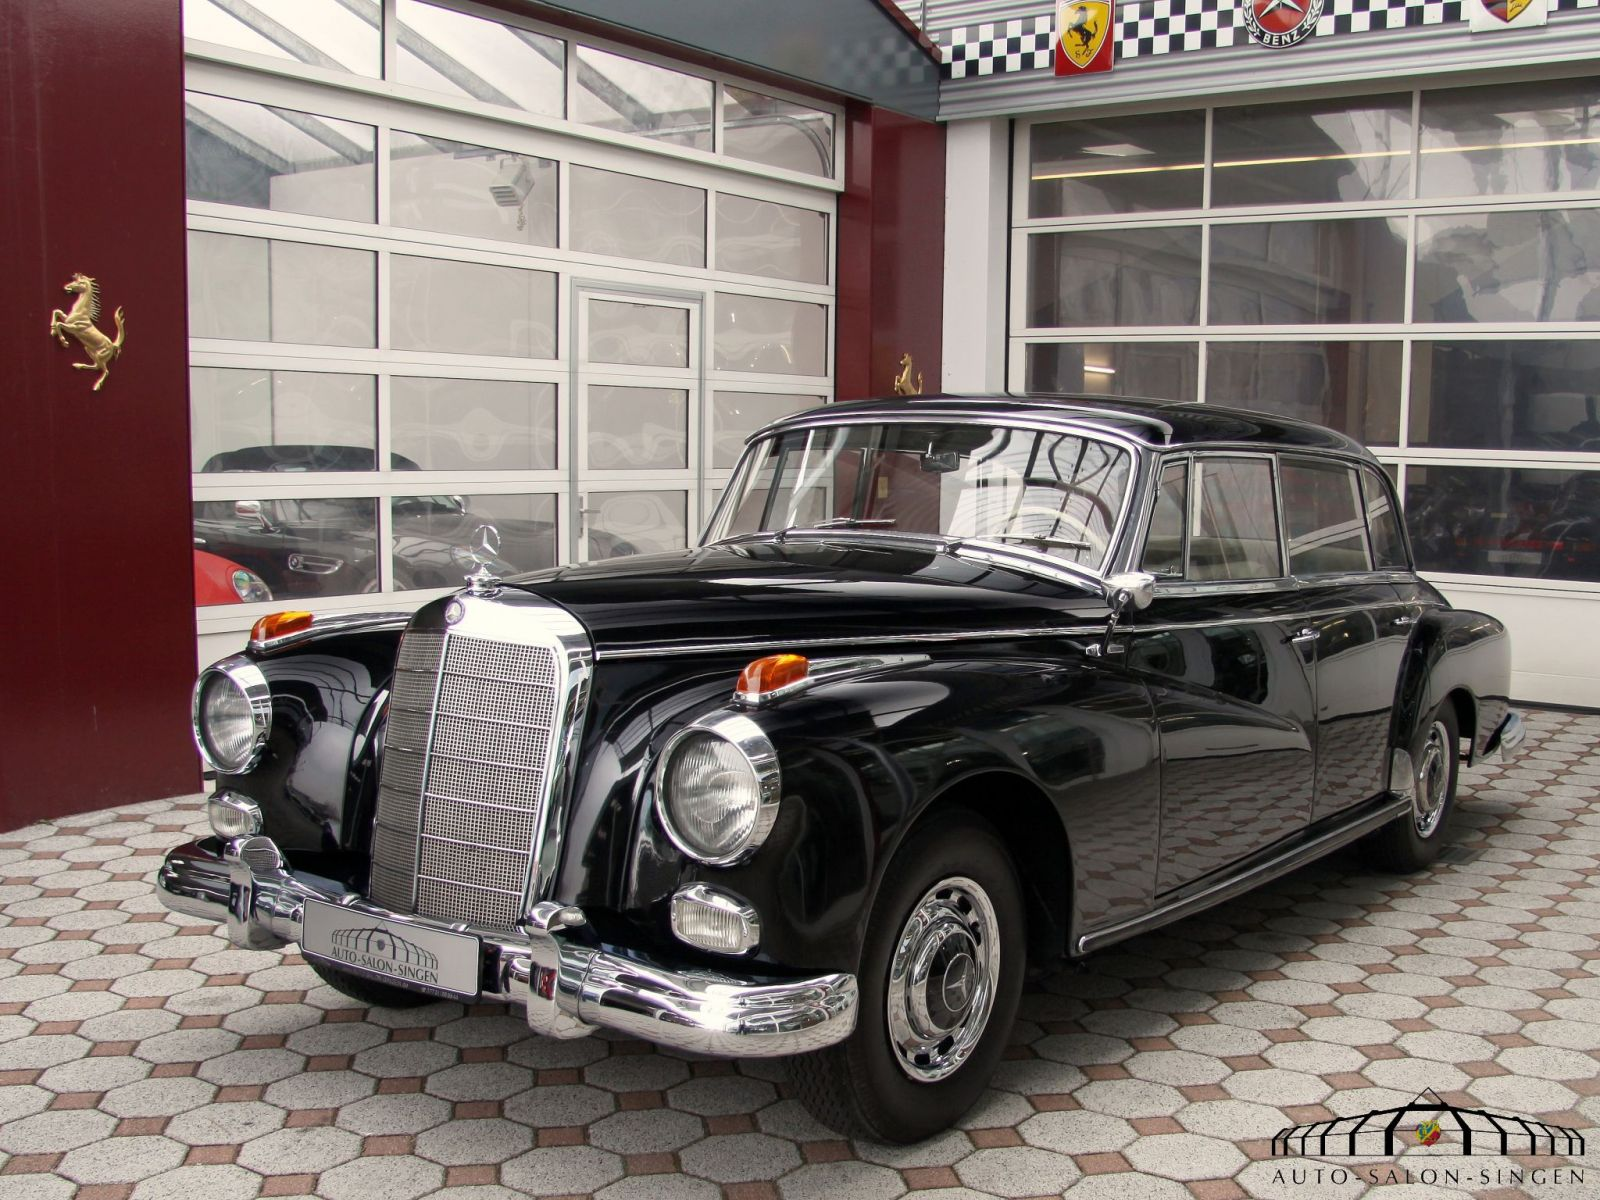 mercedes benz 300 adenauer limousine auto salon singen. Black Bedroom Furniture Sets. Home Design Ideas